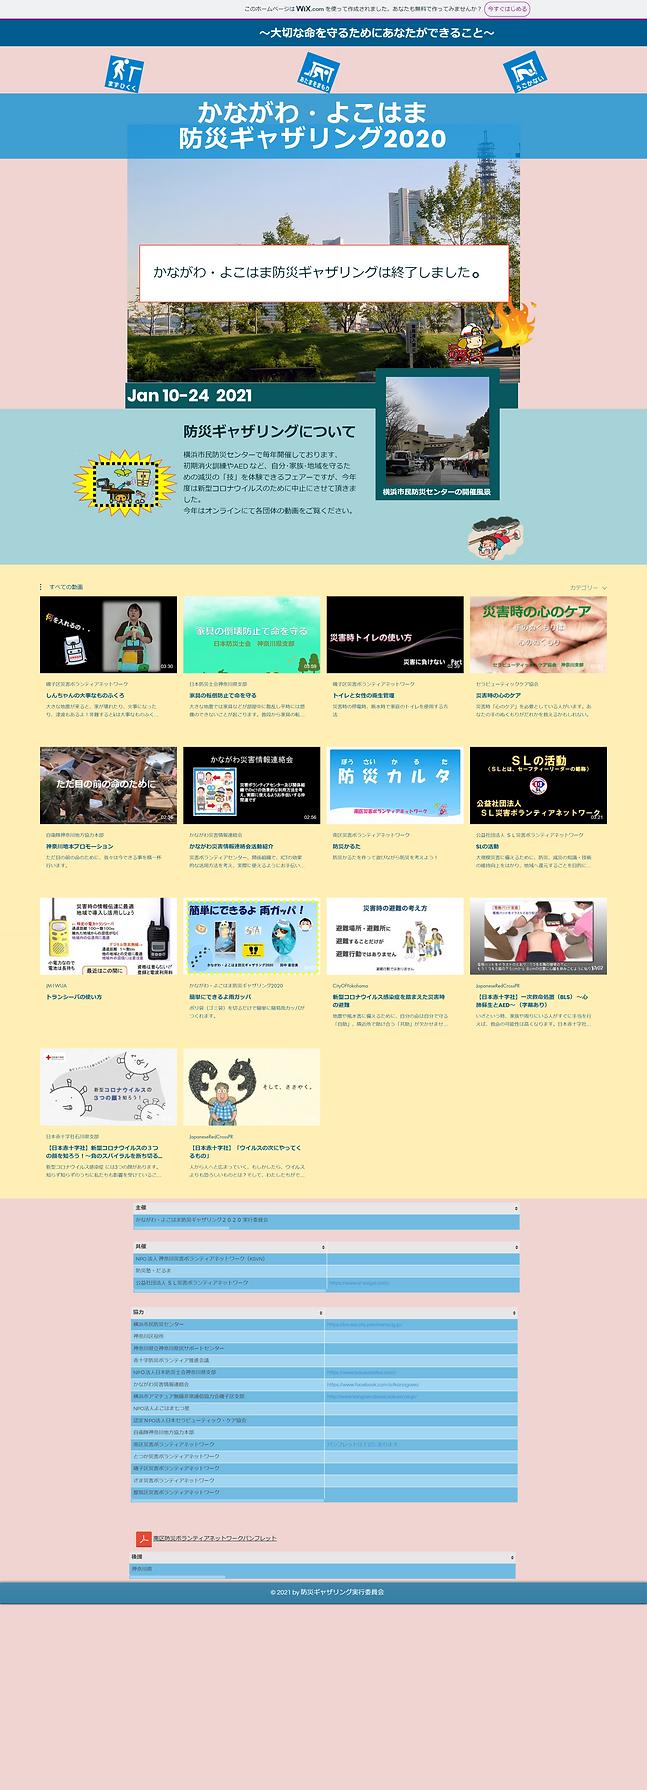 jhaldisaster.wixsite.com_mysite-4.png